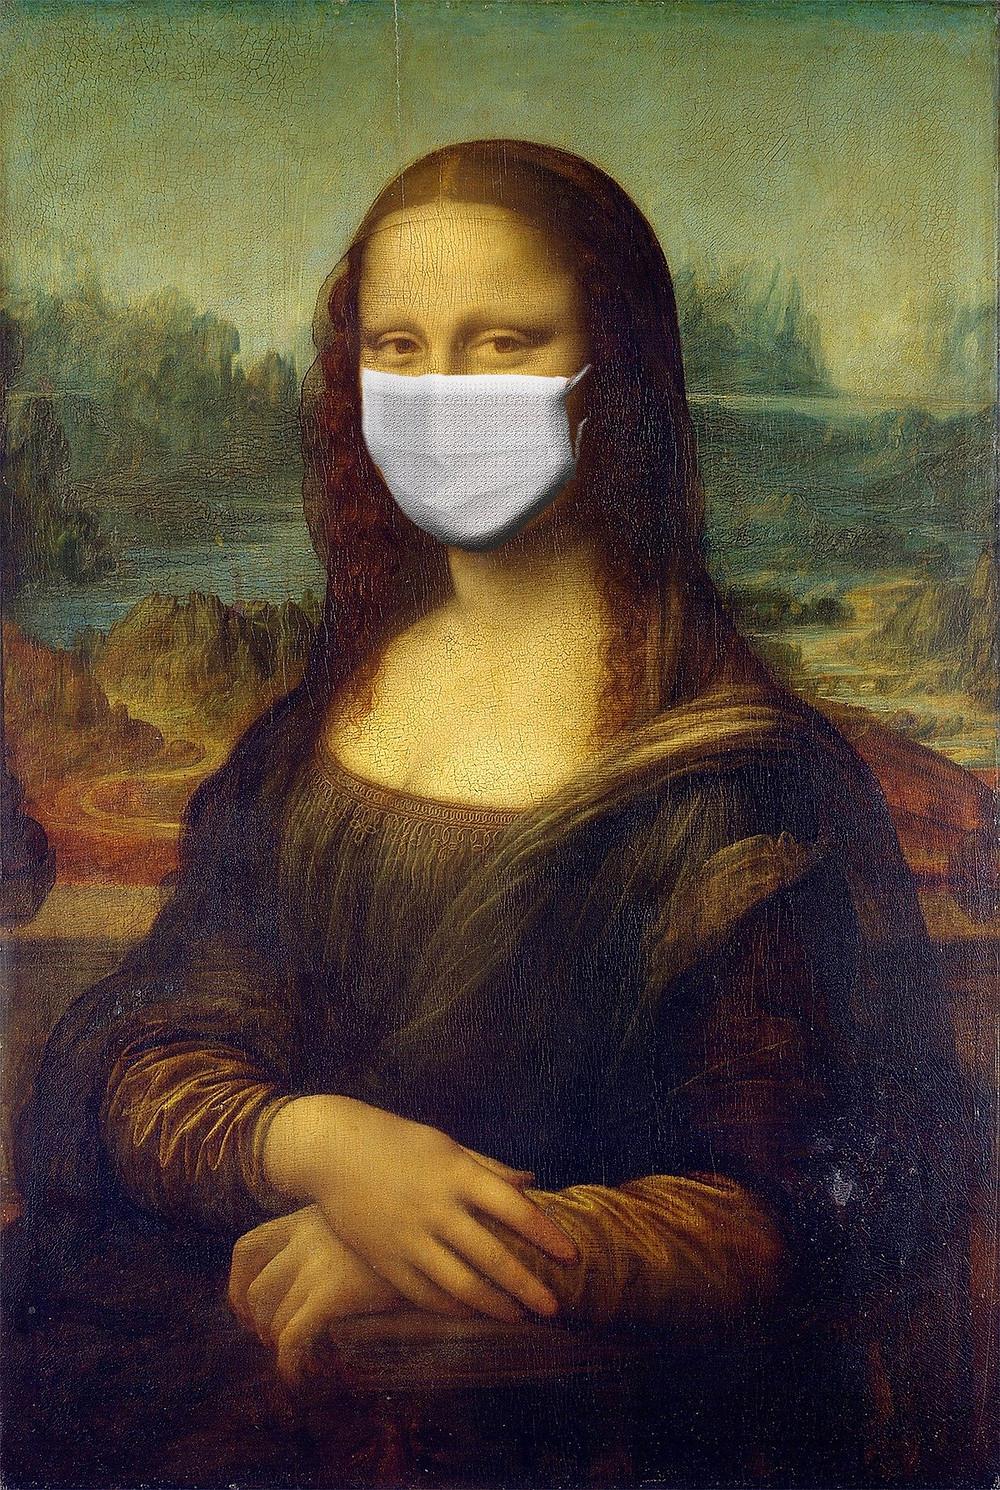 Monalisa with mask due to coronavirus or covid-19